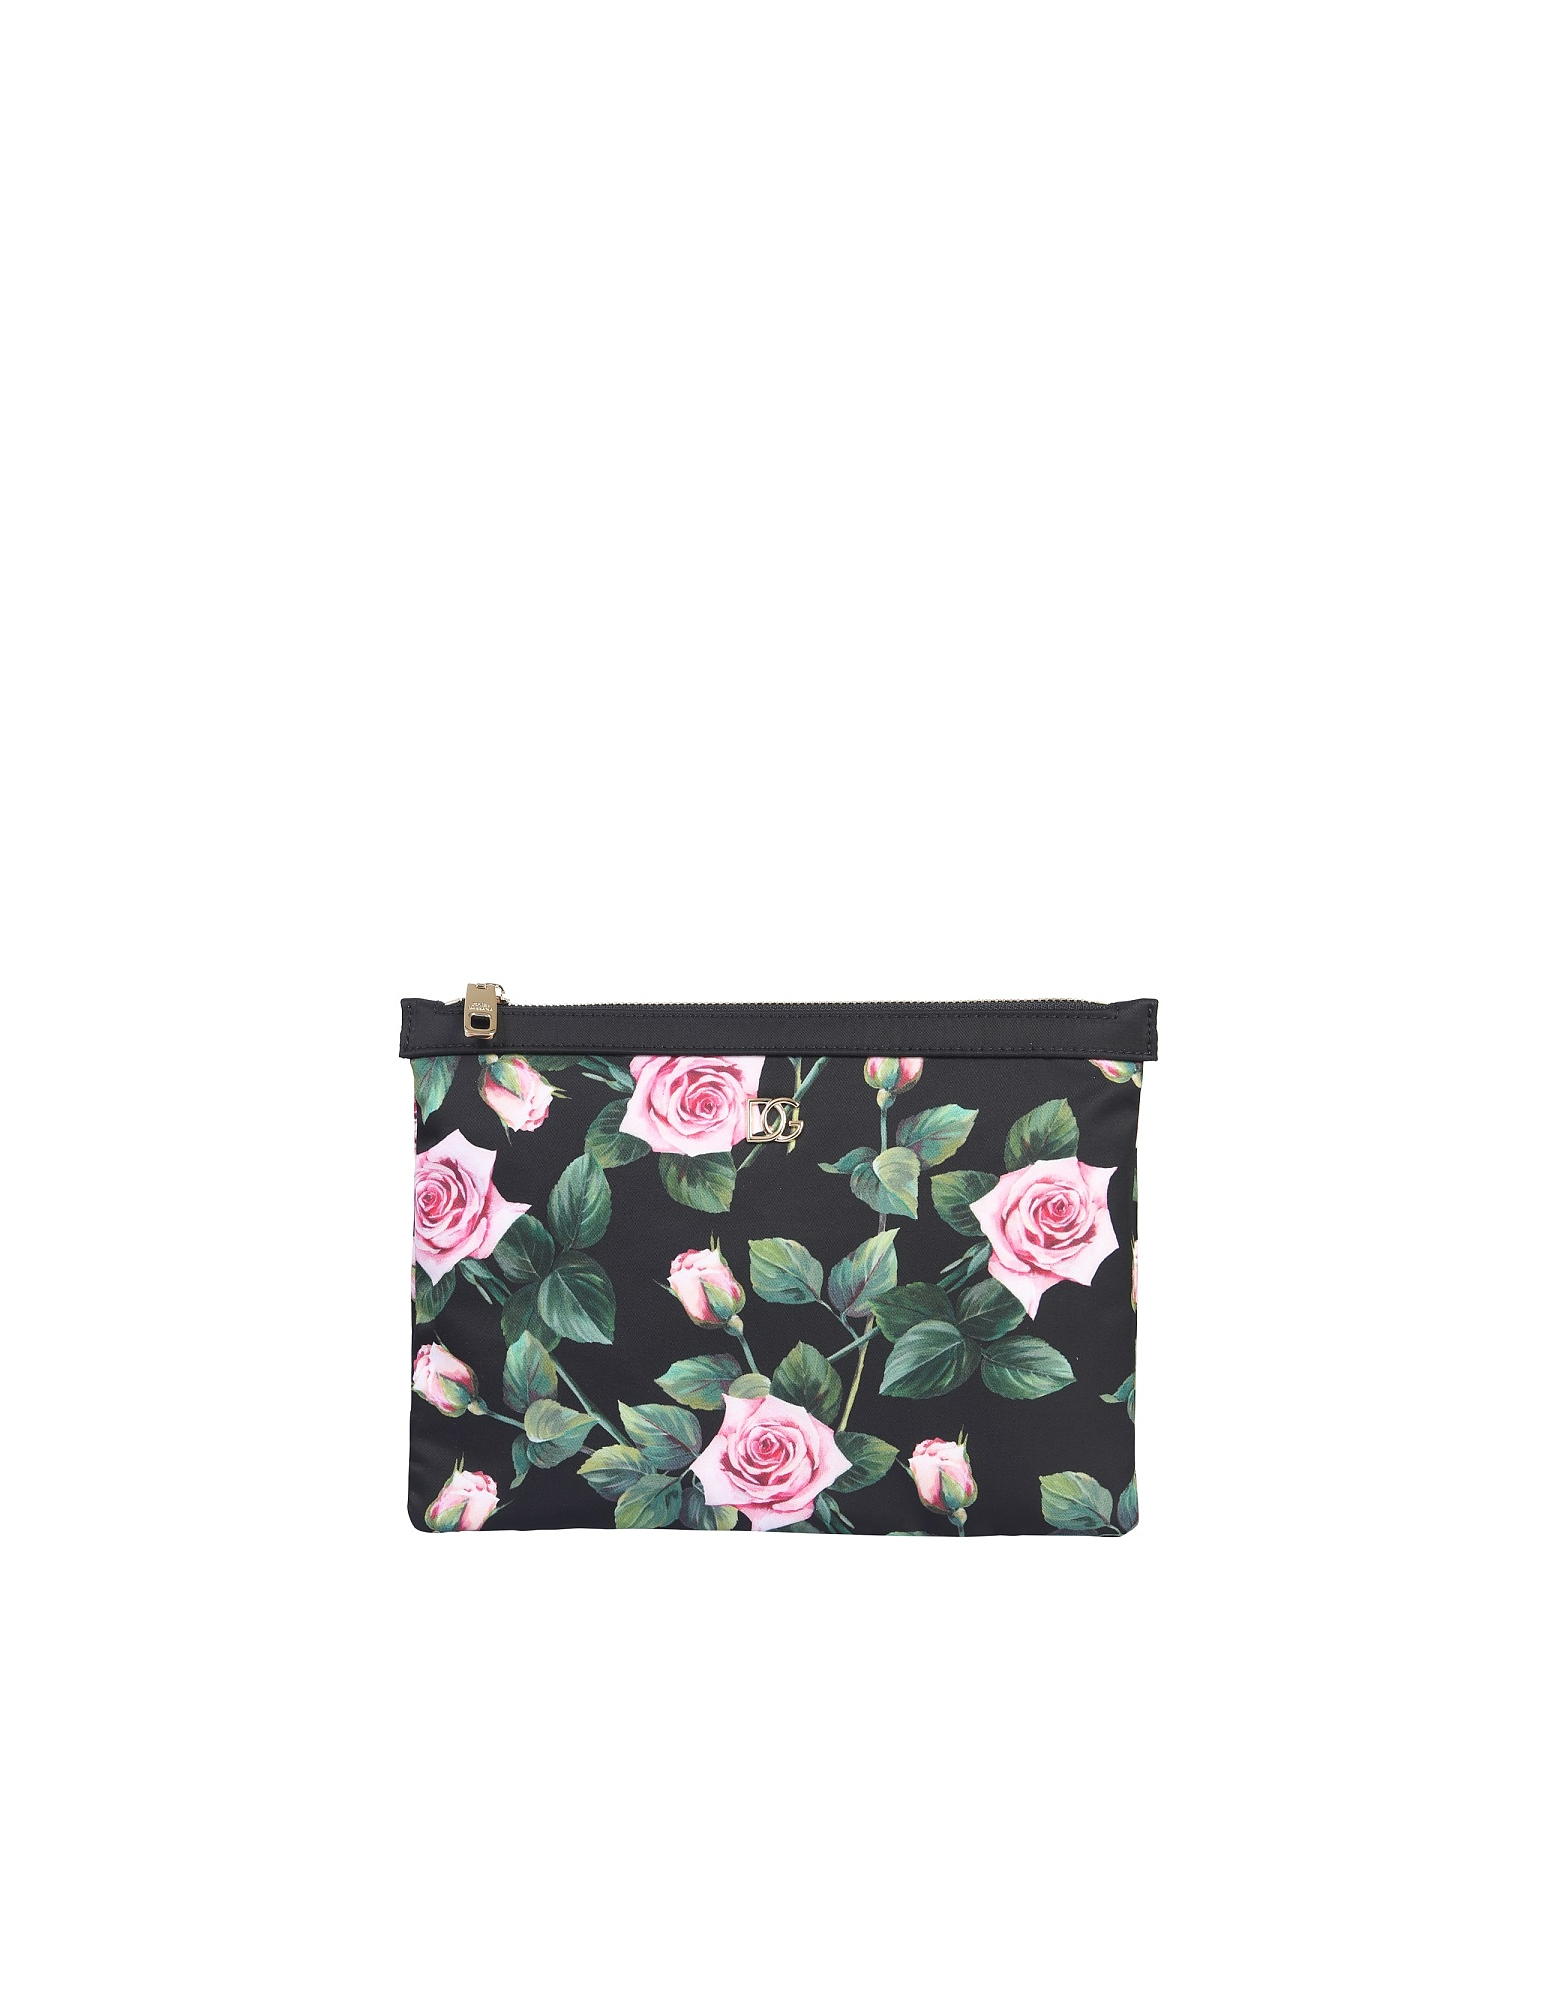 Dolce & Gabbana Flat Makeup Bag In Black